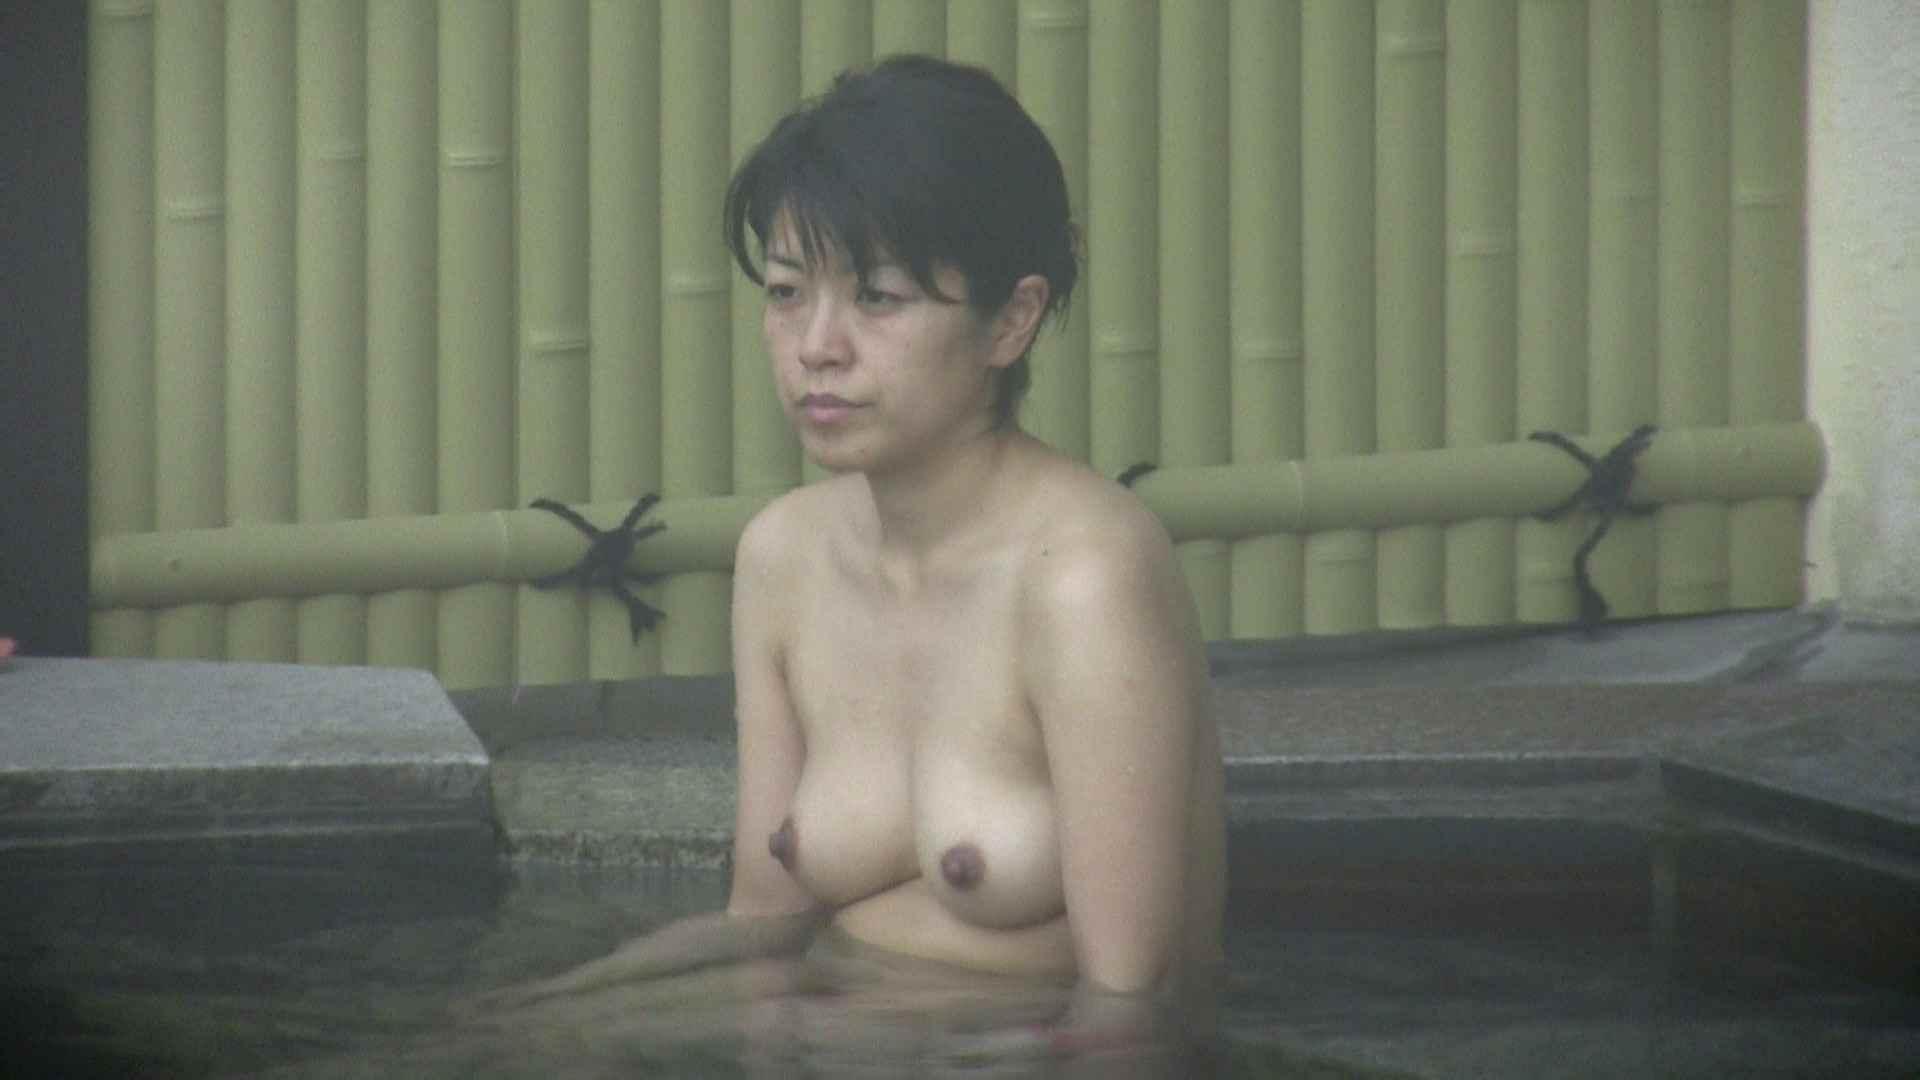 Aquaな露天風呂Vol.585 盗撮 | OLエロ画像  78PICs 46